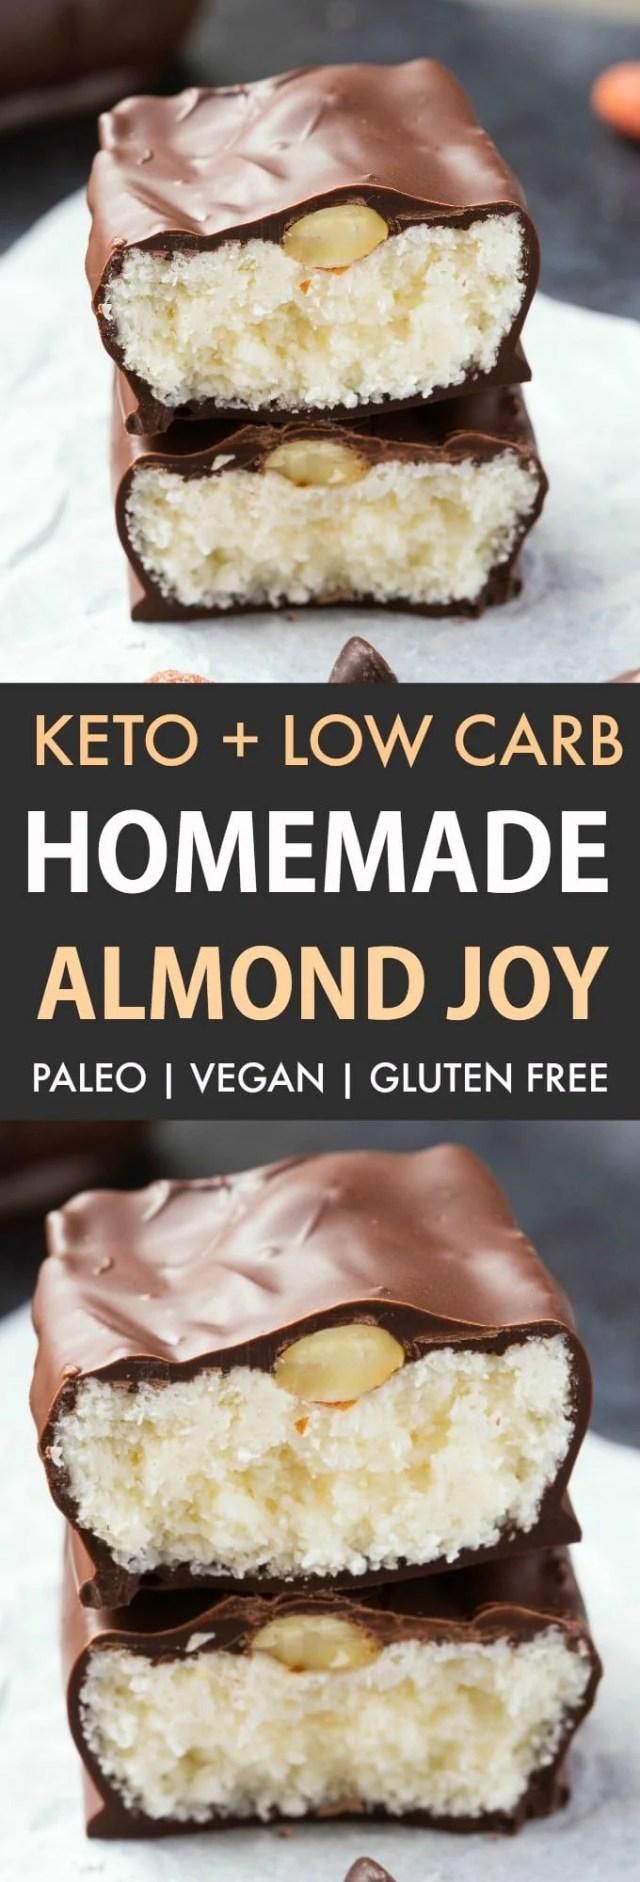 Homemade low carb and keto almond joy bars